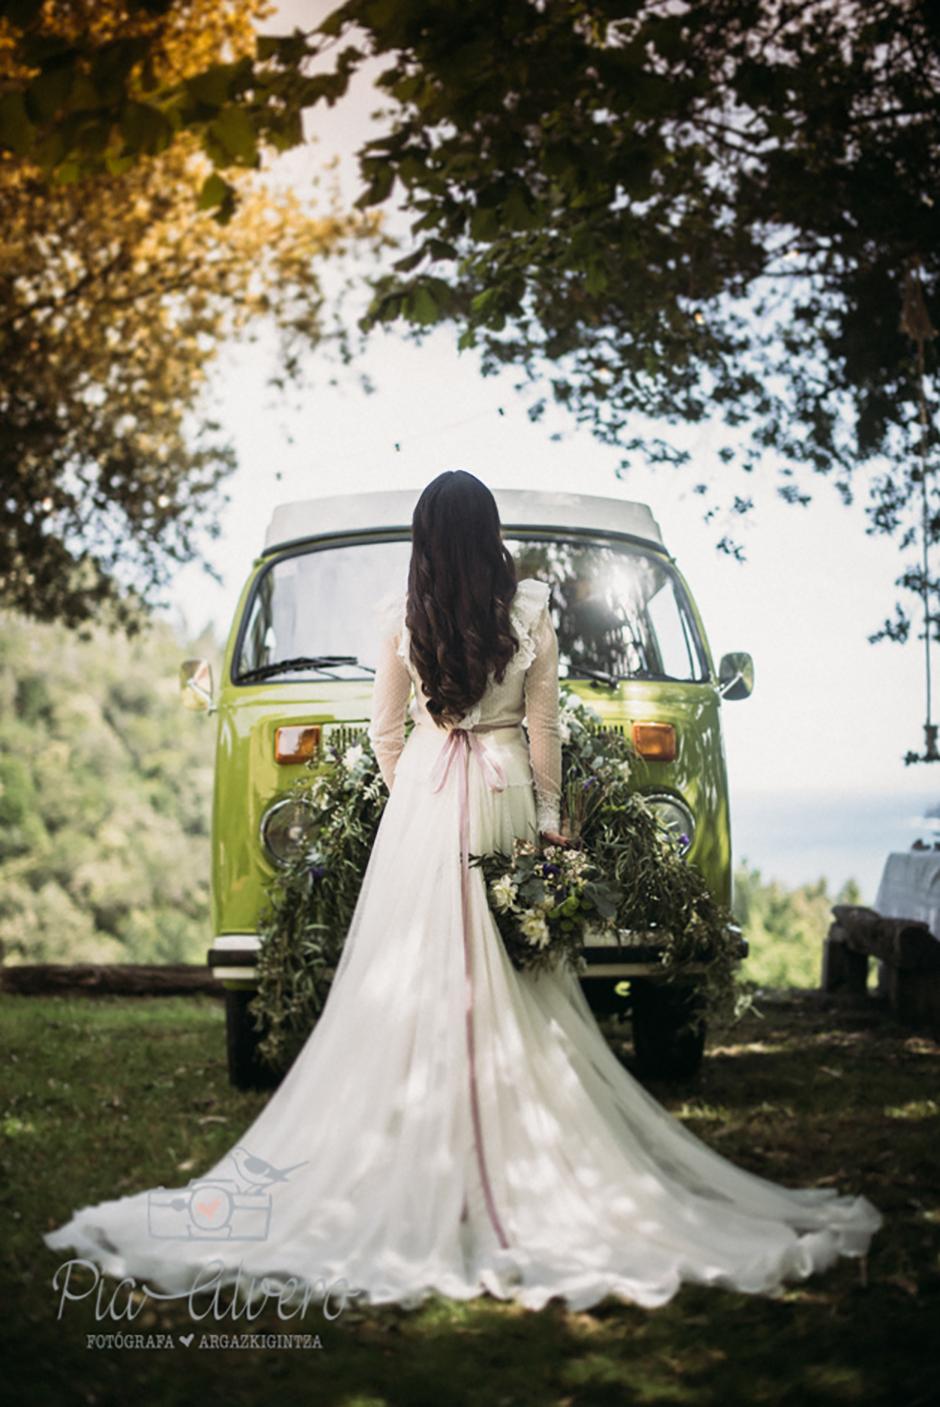 Pia Alvero fotografia editorial inspiracion de boda-295